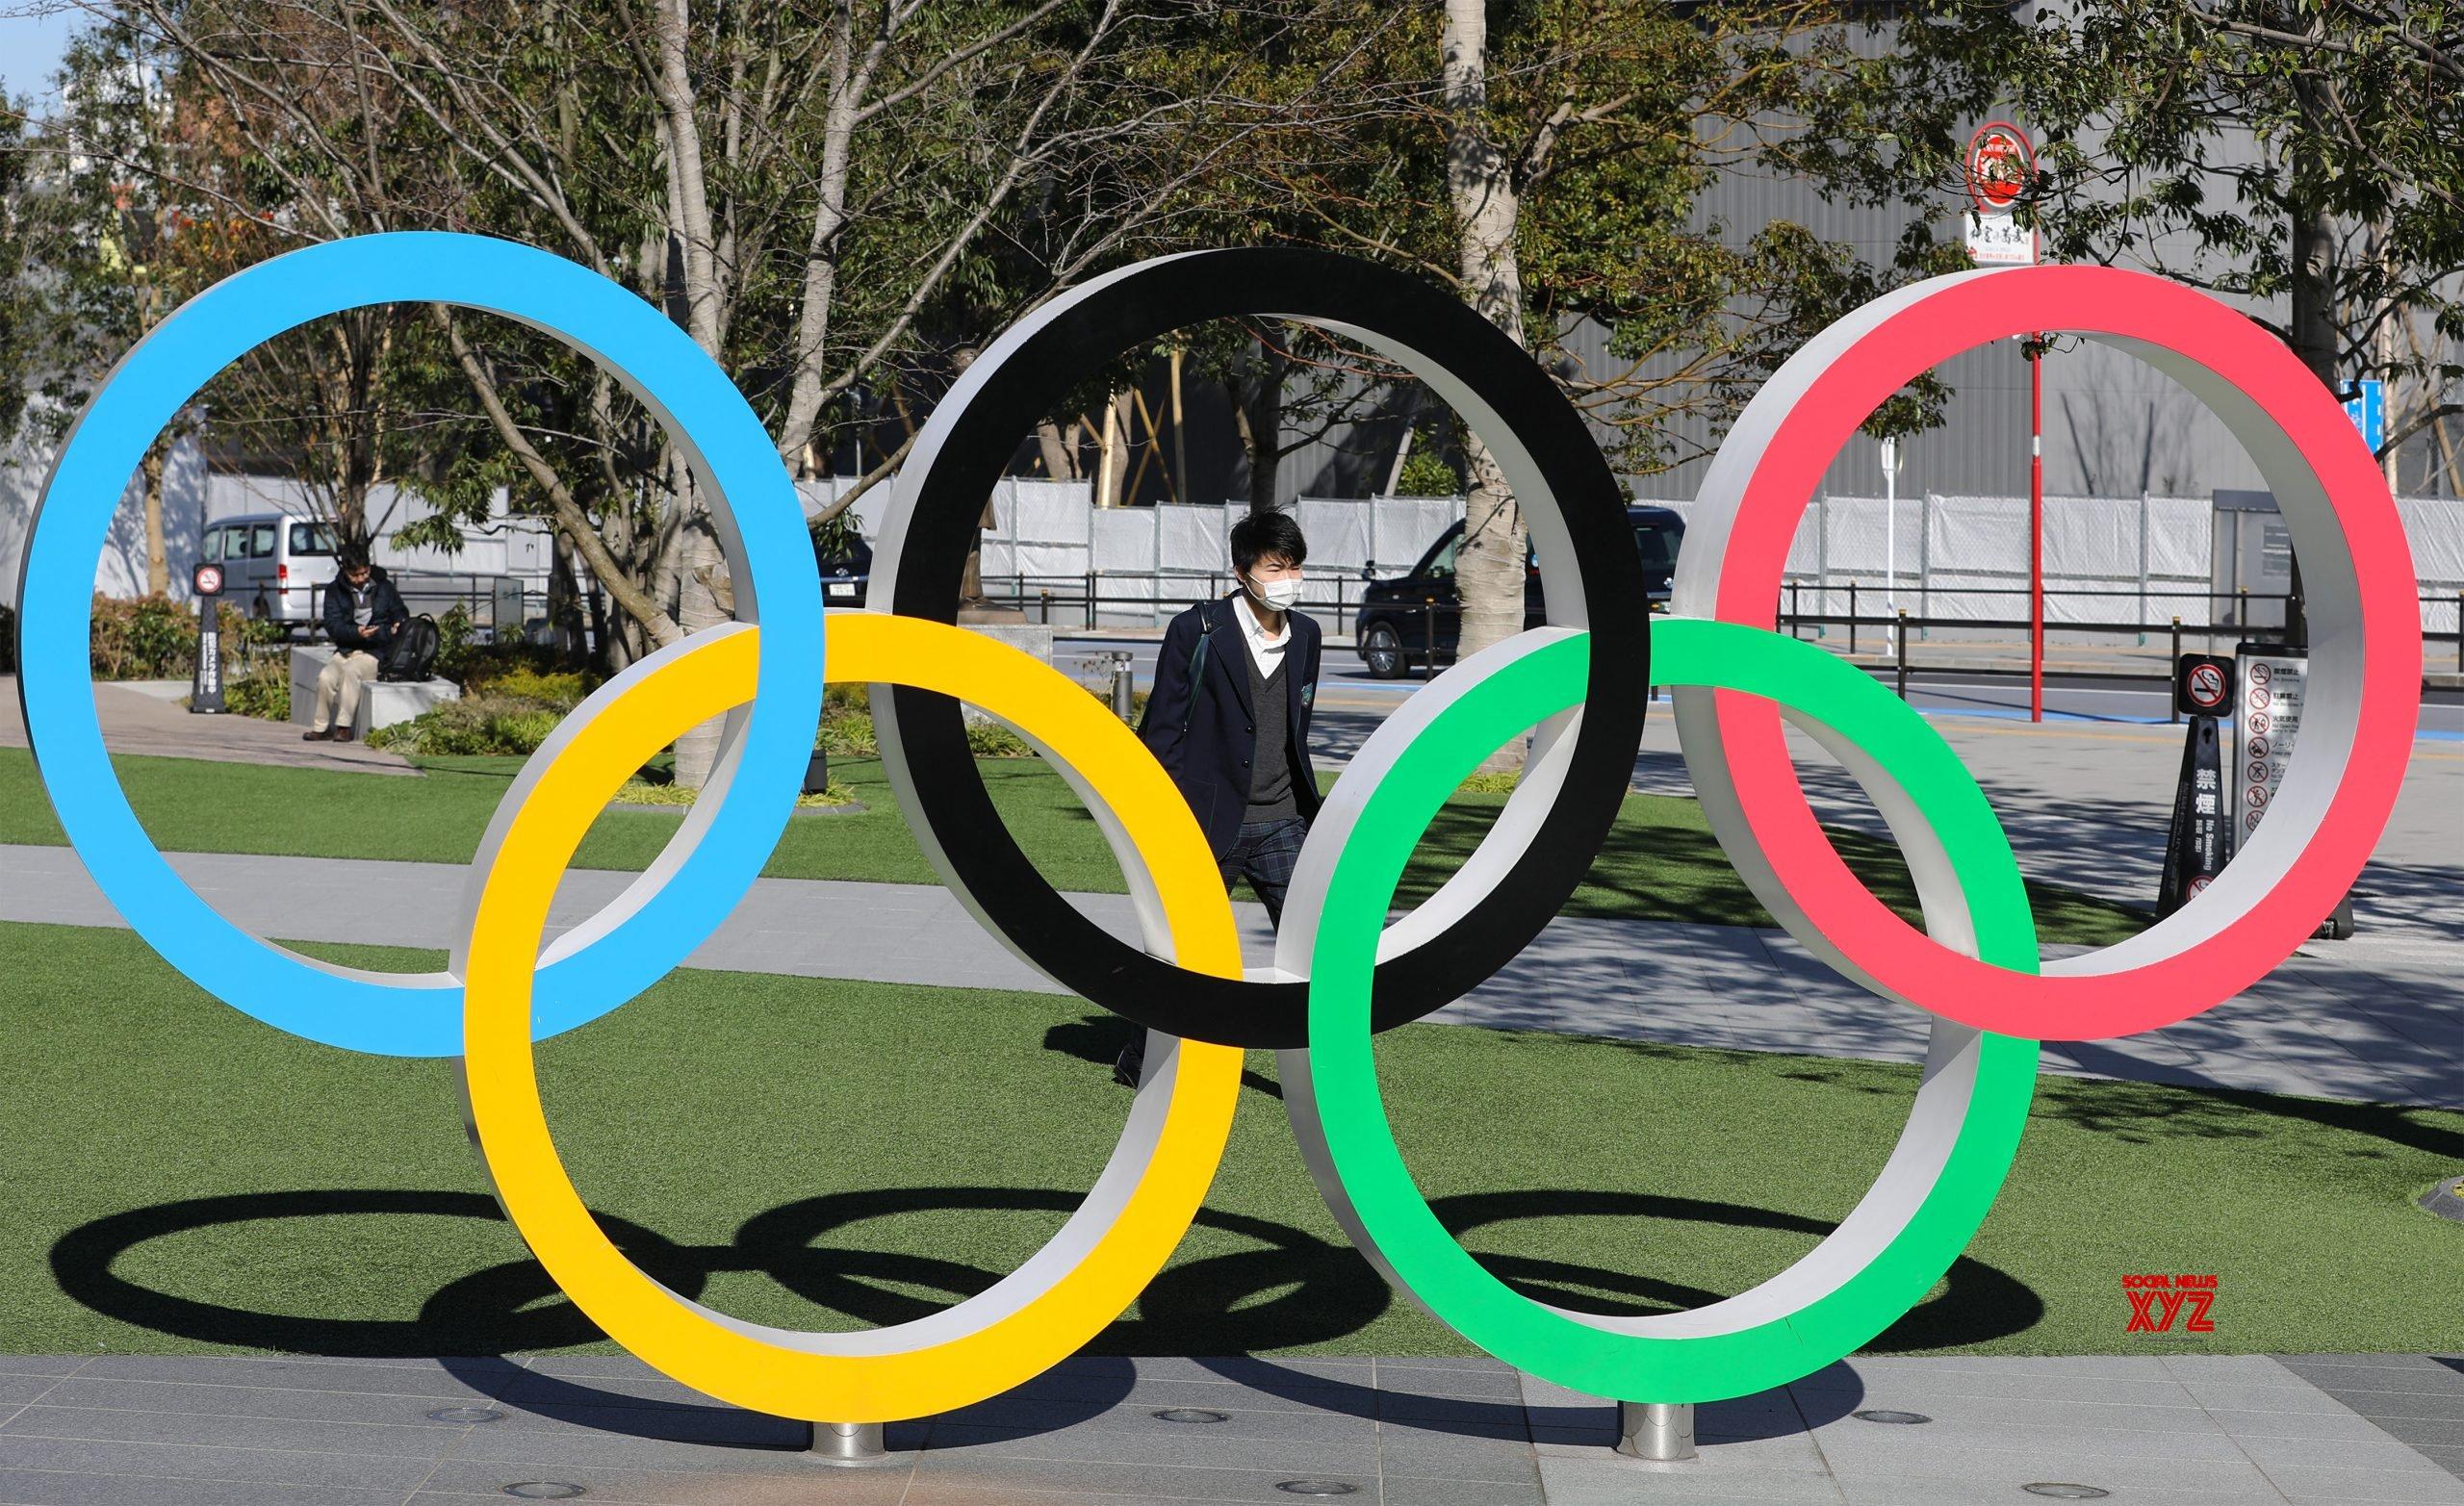 'Olympics postponement will cost massive extra money'